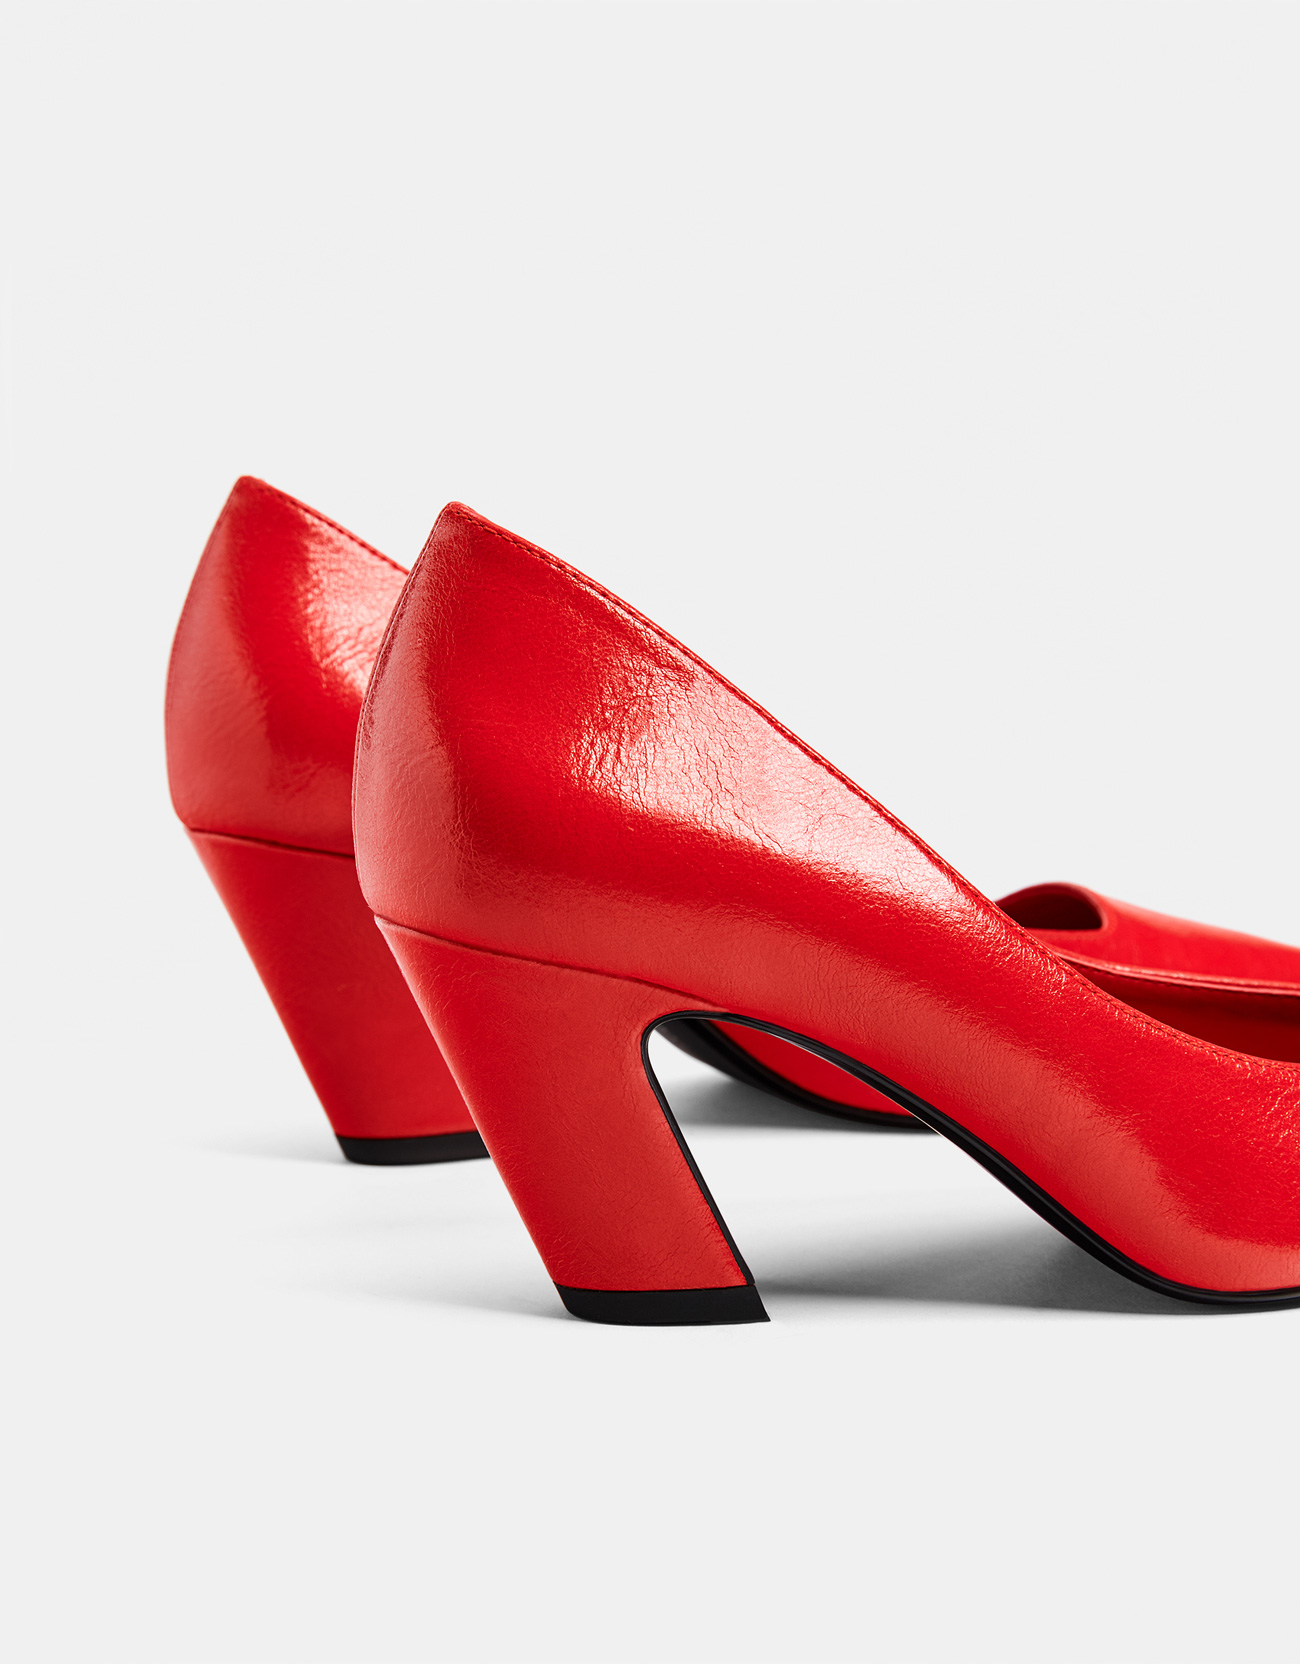 c41fa75cd175 Red mid-heel shoes - Exclusive online - Bershka Armenia